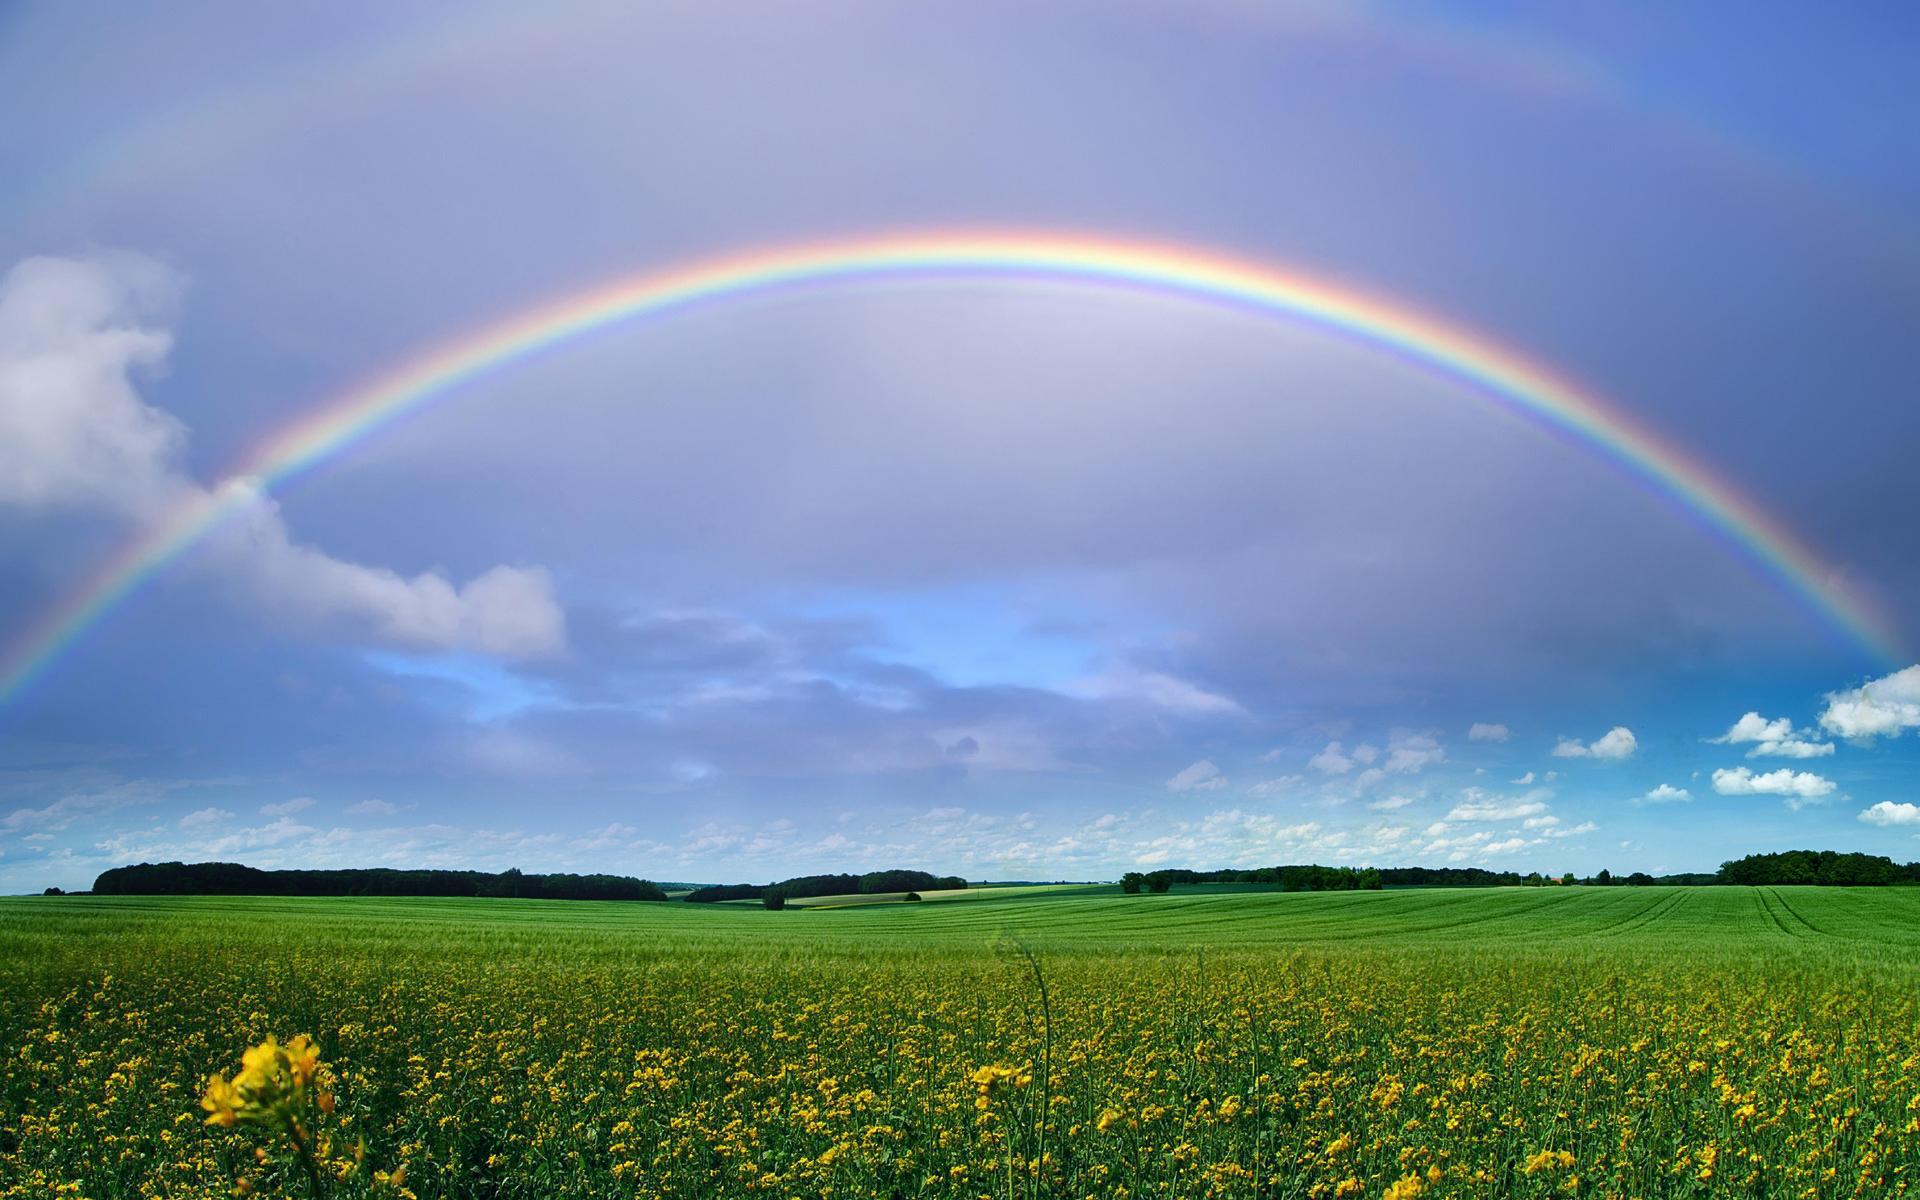 Real Rainbow Clipart Wallpaper Jpg